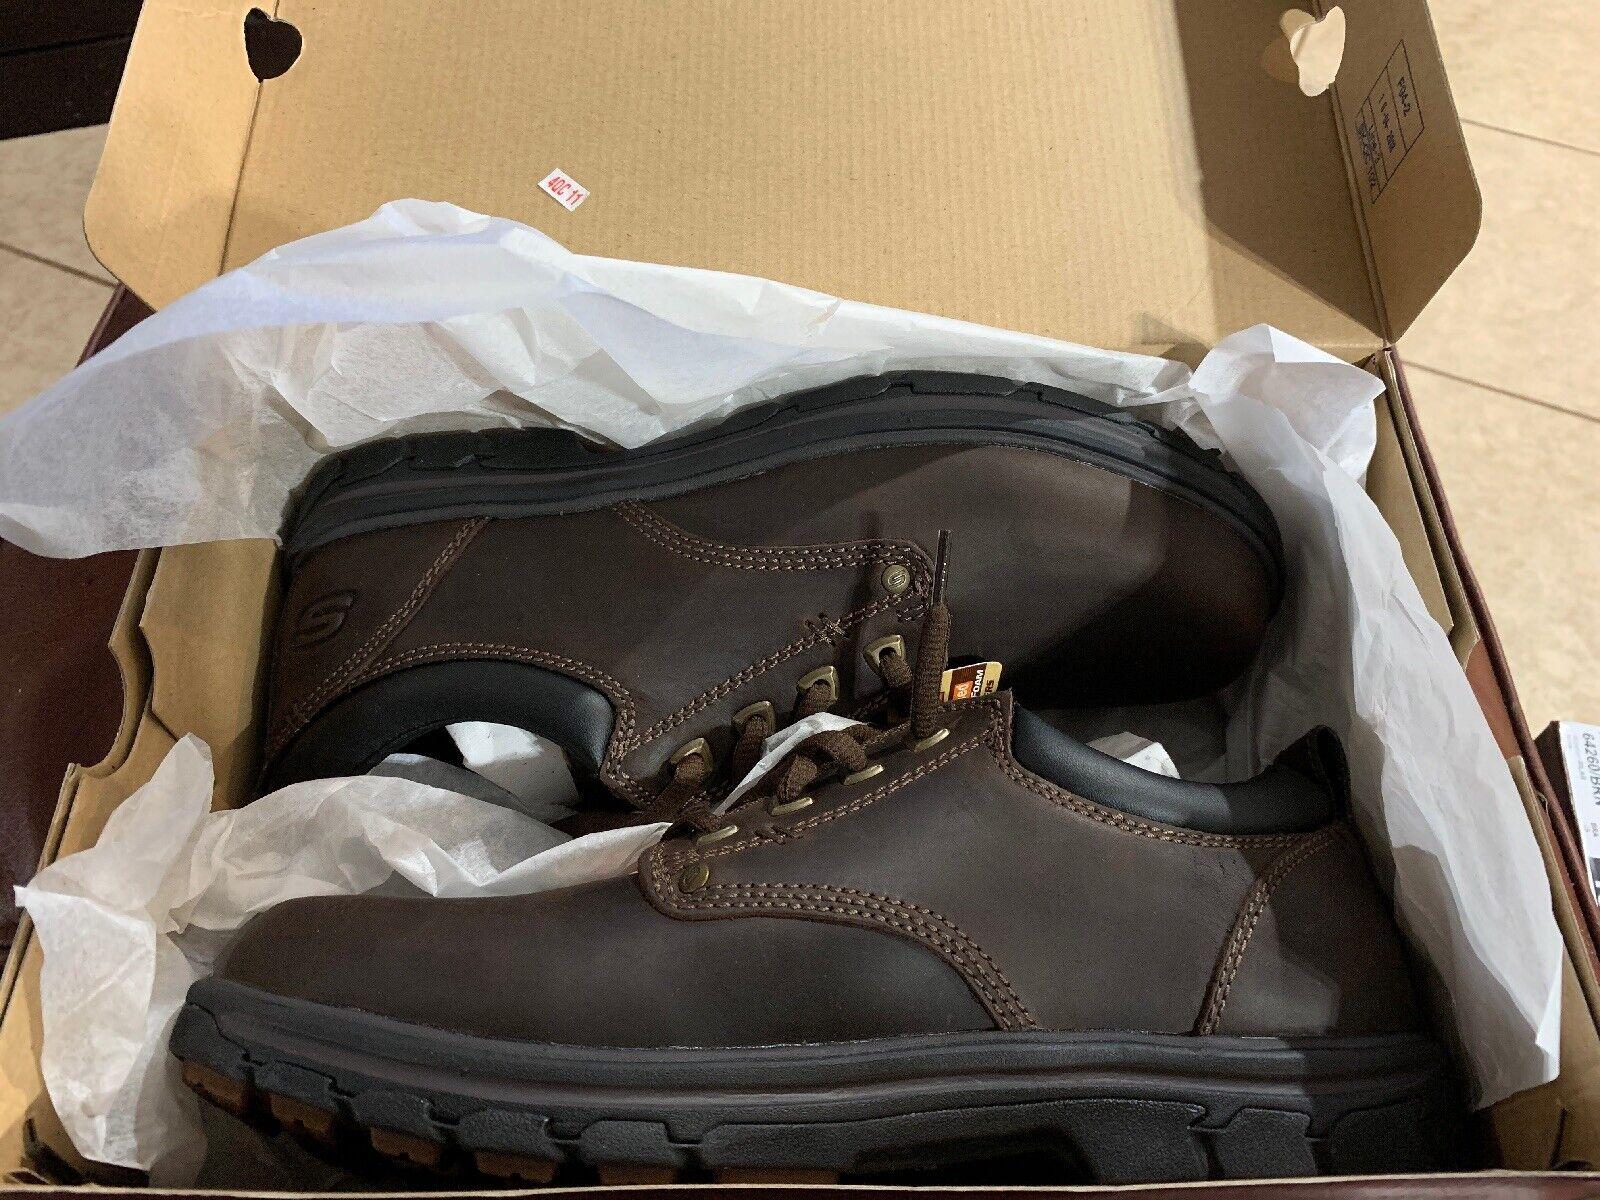 New Men's Skechers Segment-RILAR Relaxed Fit Memory Foam Brown shoes Size 9.5